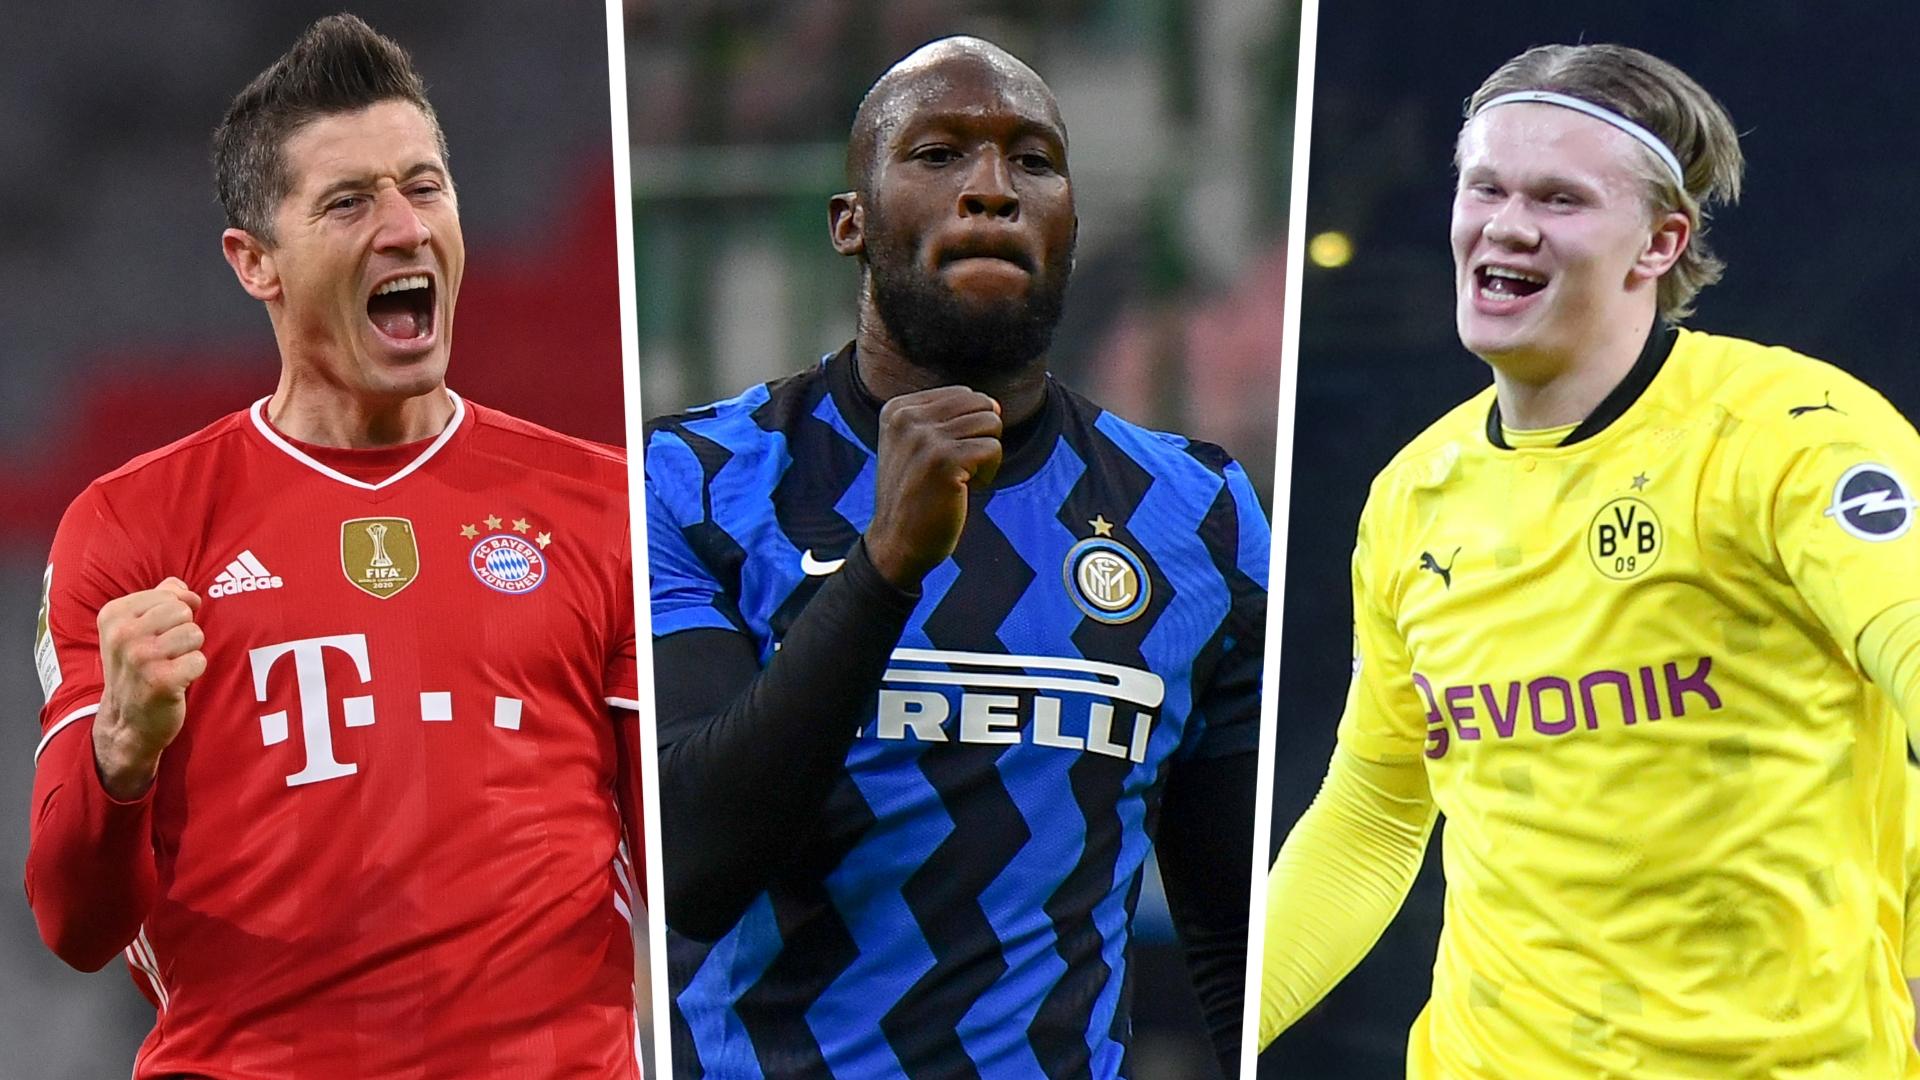 'I'll do it' – Chelsea-linked Kalajdzic addresses transfer talk after starring for Stuttgart and Austria at Euro 2020